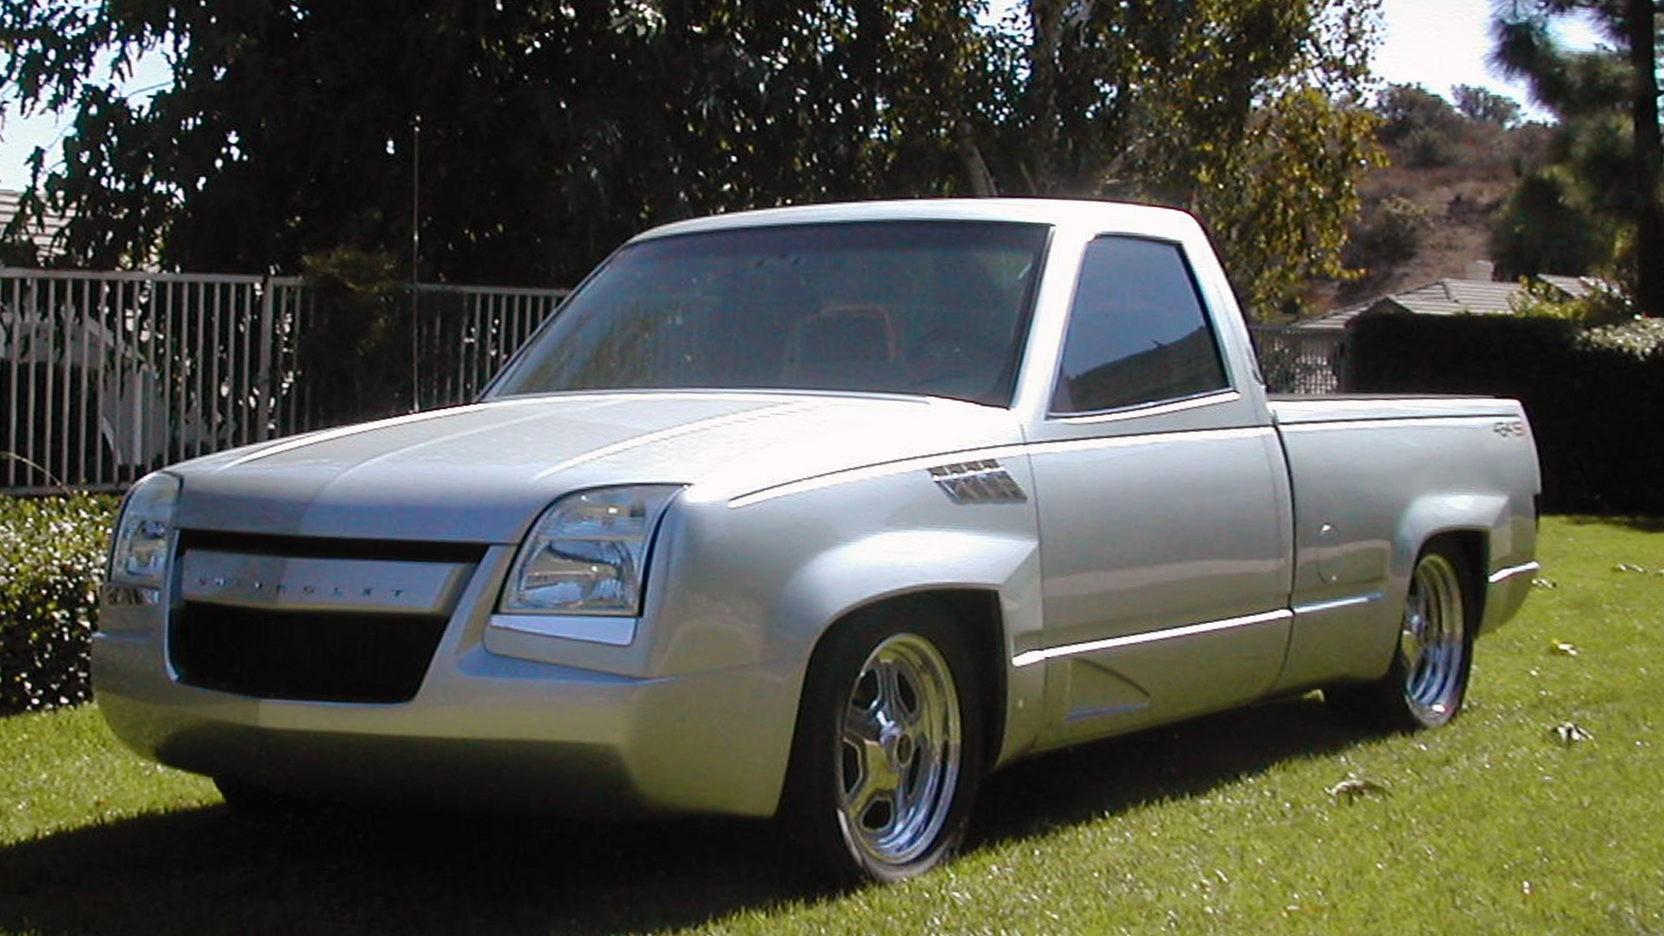 Chevrolet Silverado Ss Wheels >> Hot Wheels Creator Harry Bradley Designed This 1990 Chevrolet 454 SS Pickup - autoevolution